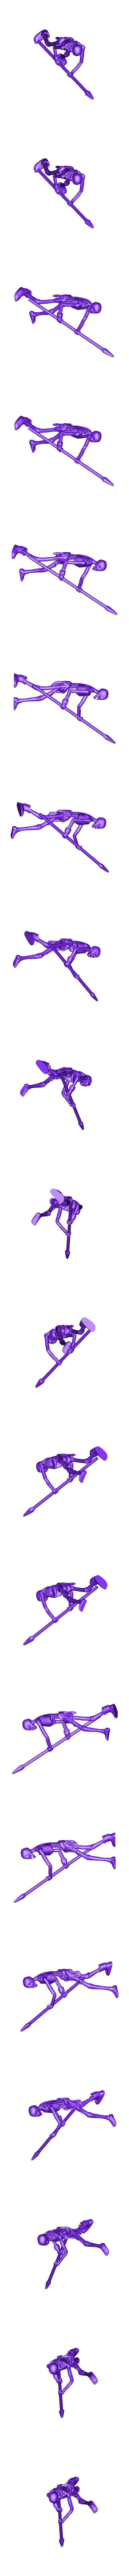 SkeletonWarrior2SOLID.stl Download STL file Sekeltons - 28mm D&D Miniatures  • 3D printing template, pyrokahd